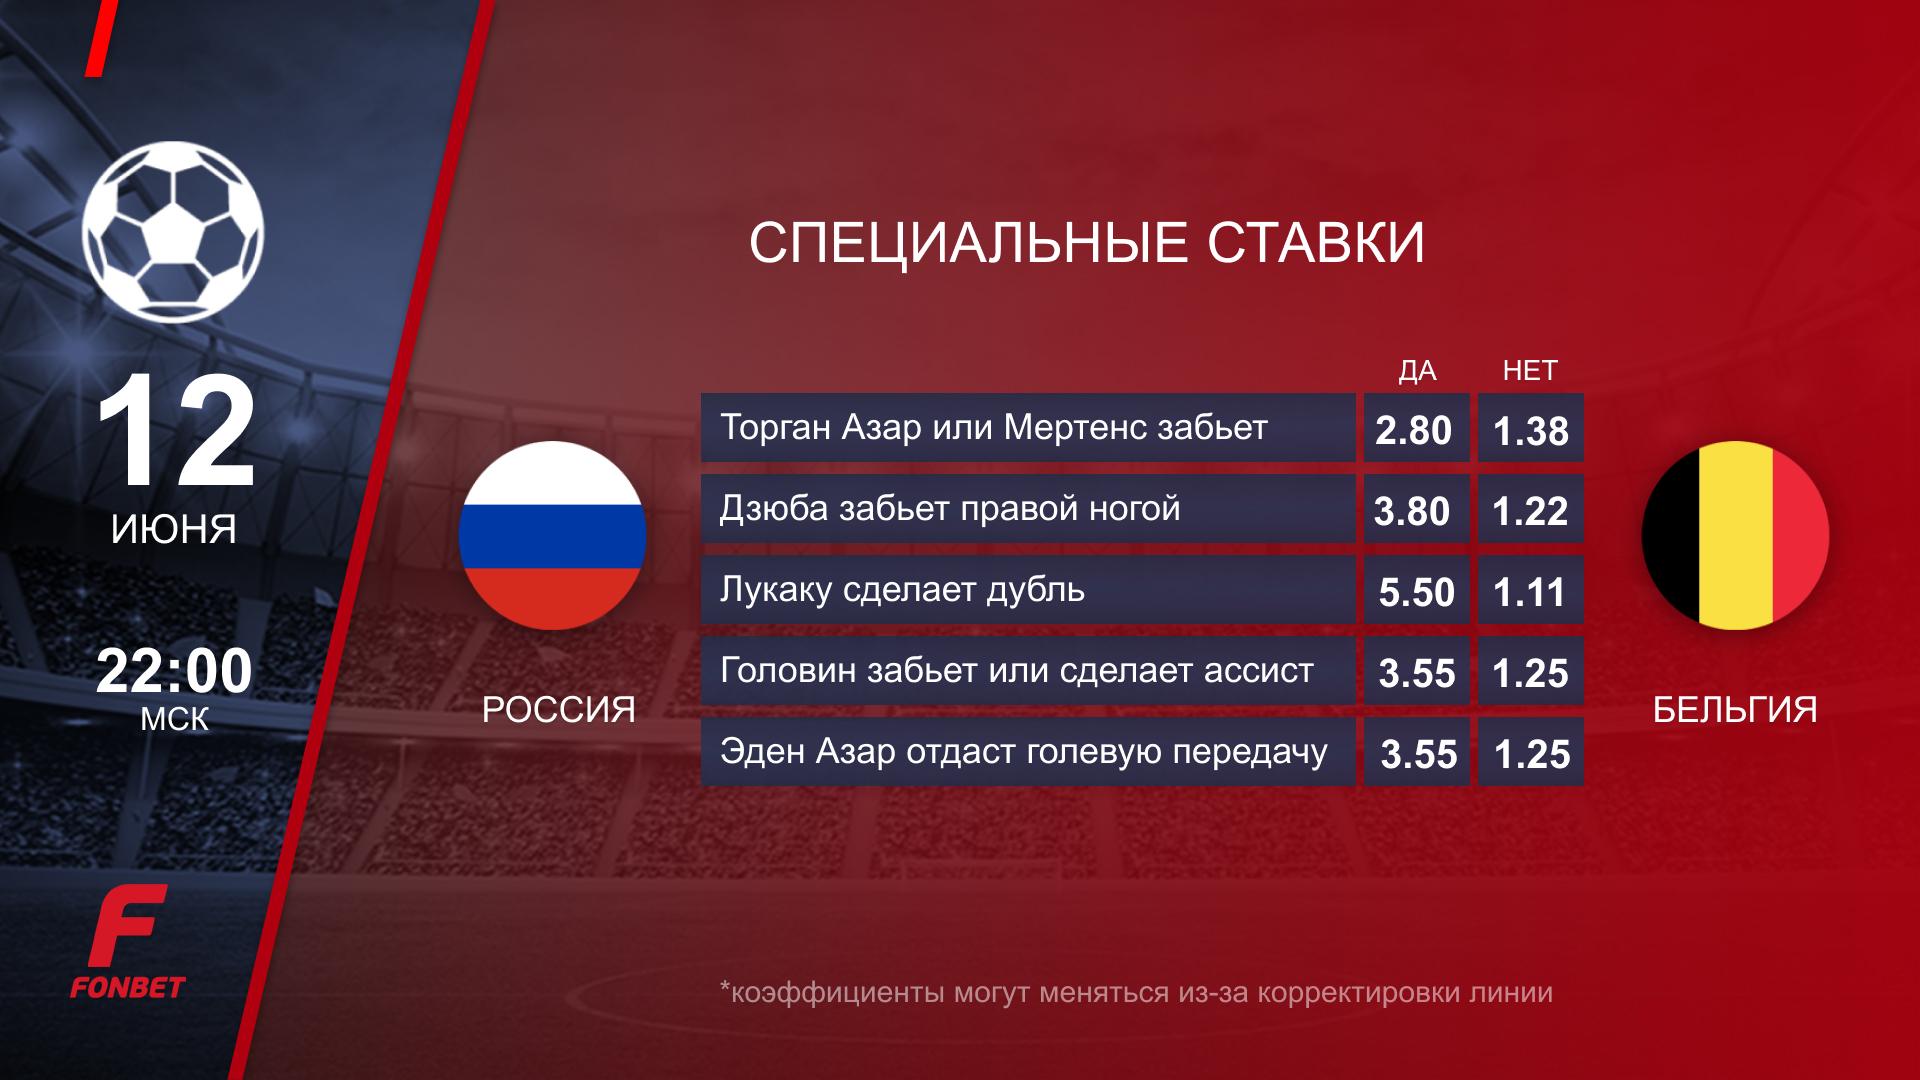 Фонбет матч бельгия россия плей маркет ставки на спорт